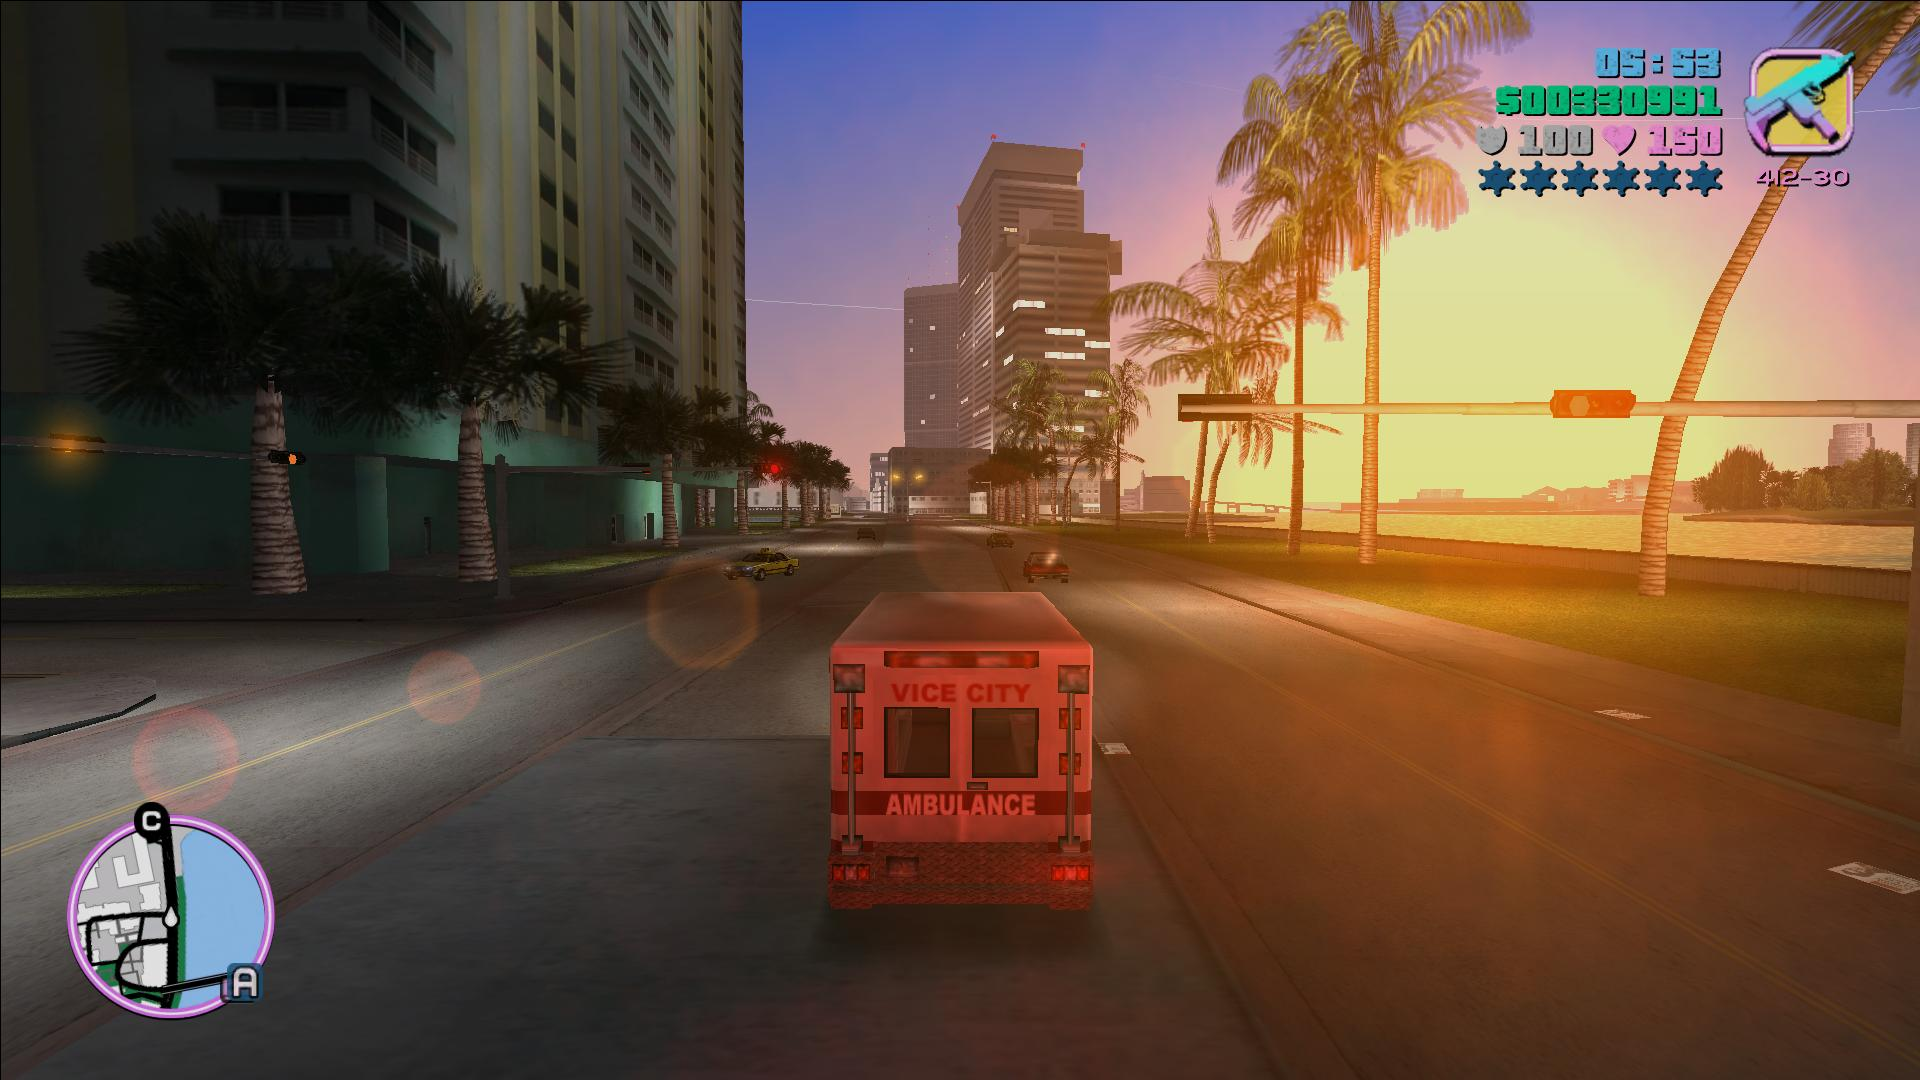 Grand Theft Auto 3 - Vice City 2018-09-14 23-15-26-17.jpg - Grand Theft Auto: Vice City